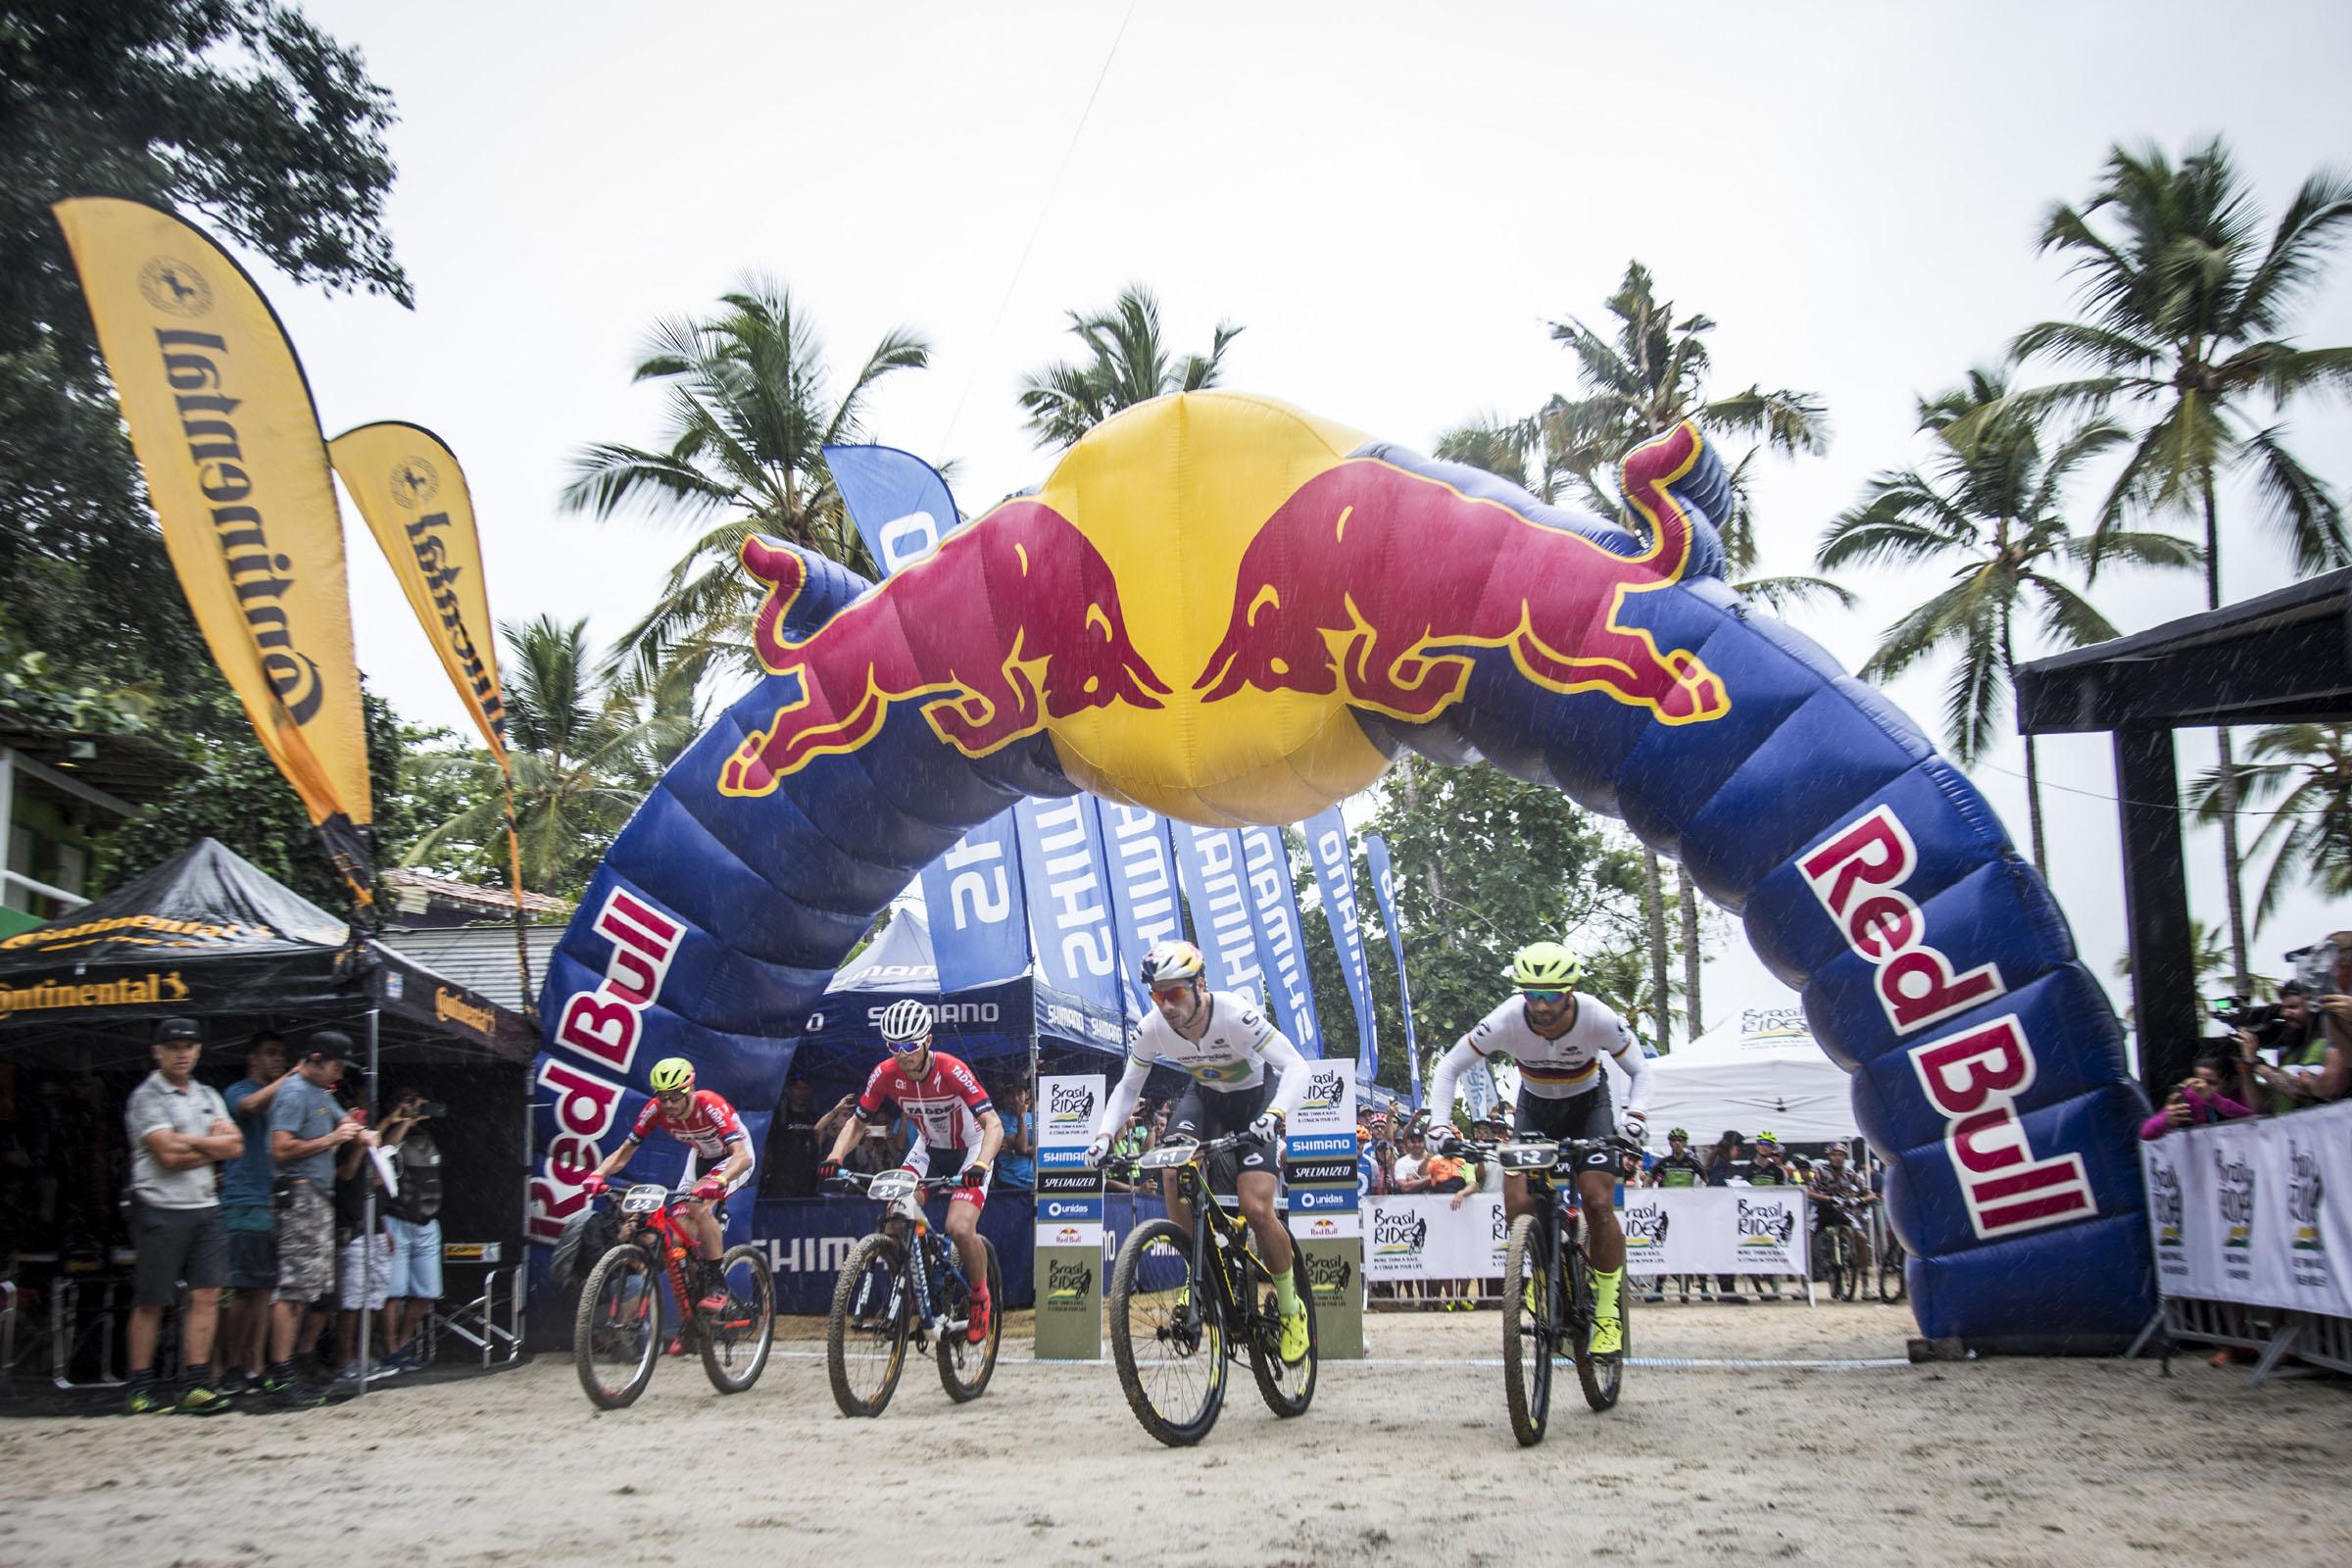 Sebastian Fini repete feito de 2017 e vence o prólogo da Brasil Ride ao lado de Martins Blums